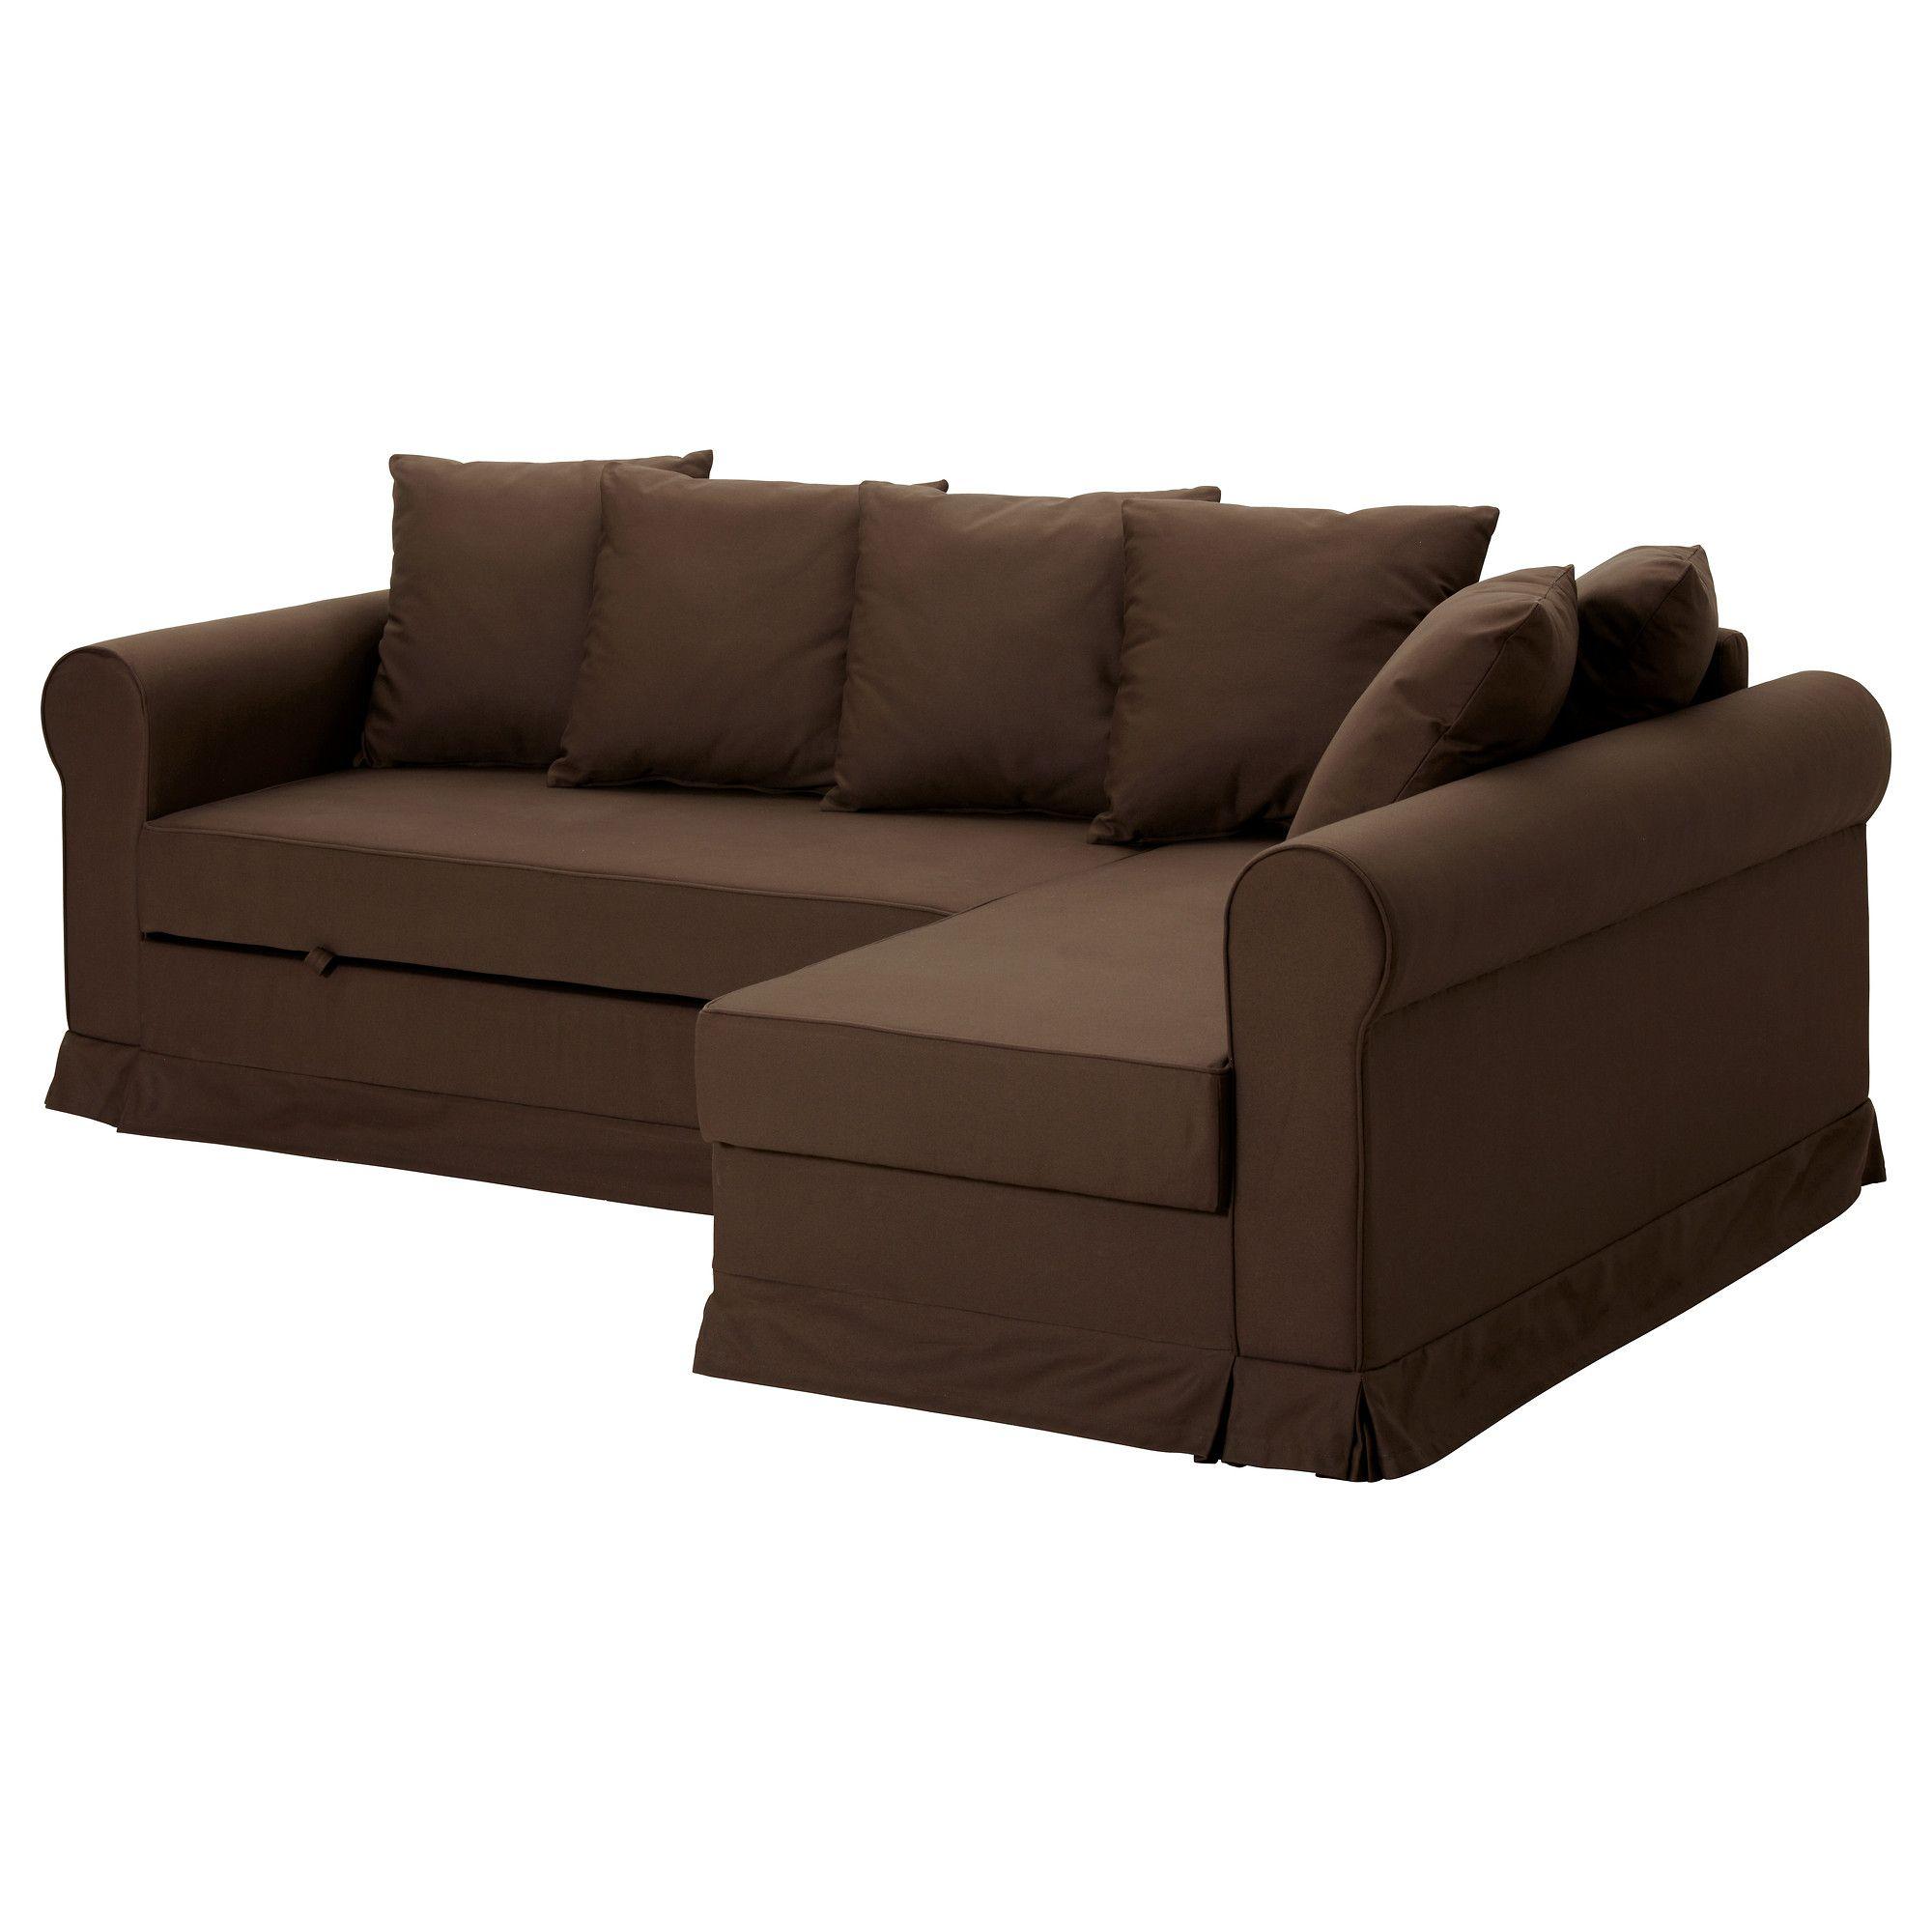 hj lmaren wall shelf black brown ikea sofa chocolate. Black Bedroom Furniture Sets. Home Design Ideas